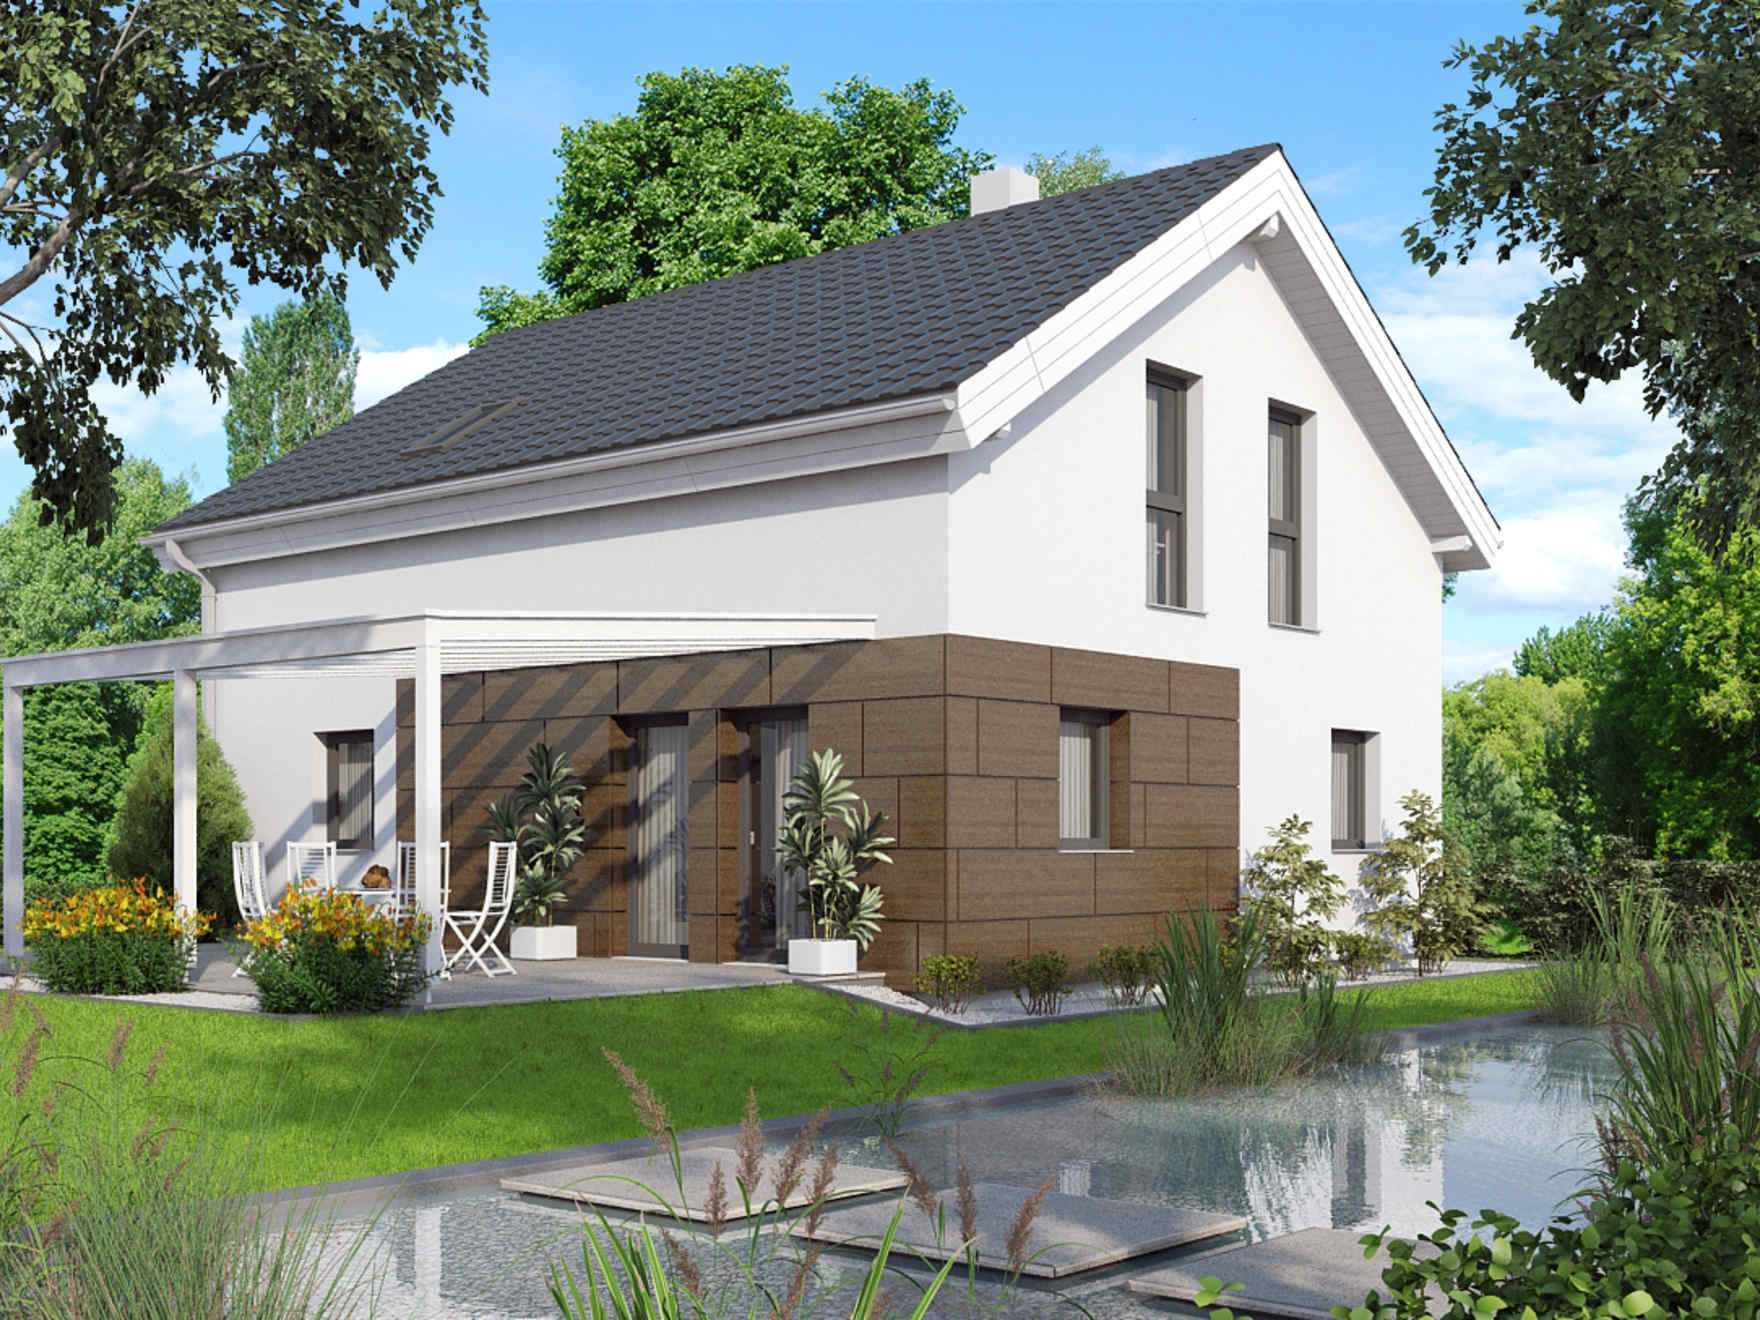 vario haus family iii gibtdemlebeneinzuhause einfamilienhaus fertighaus fertigteilhaus. Black Bedroom Furniture Sets. Home Design Ideas